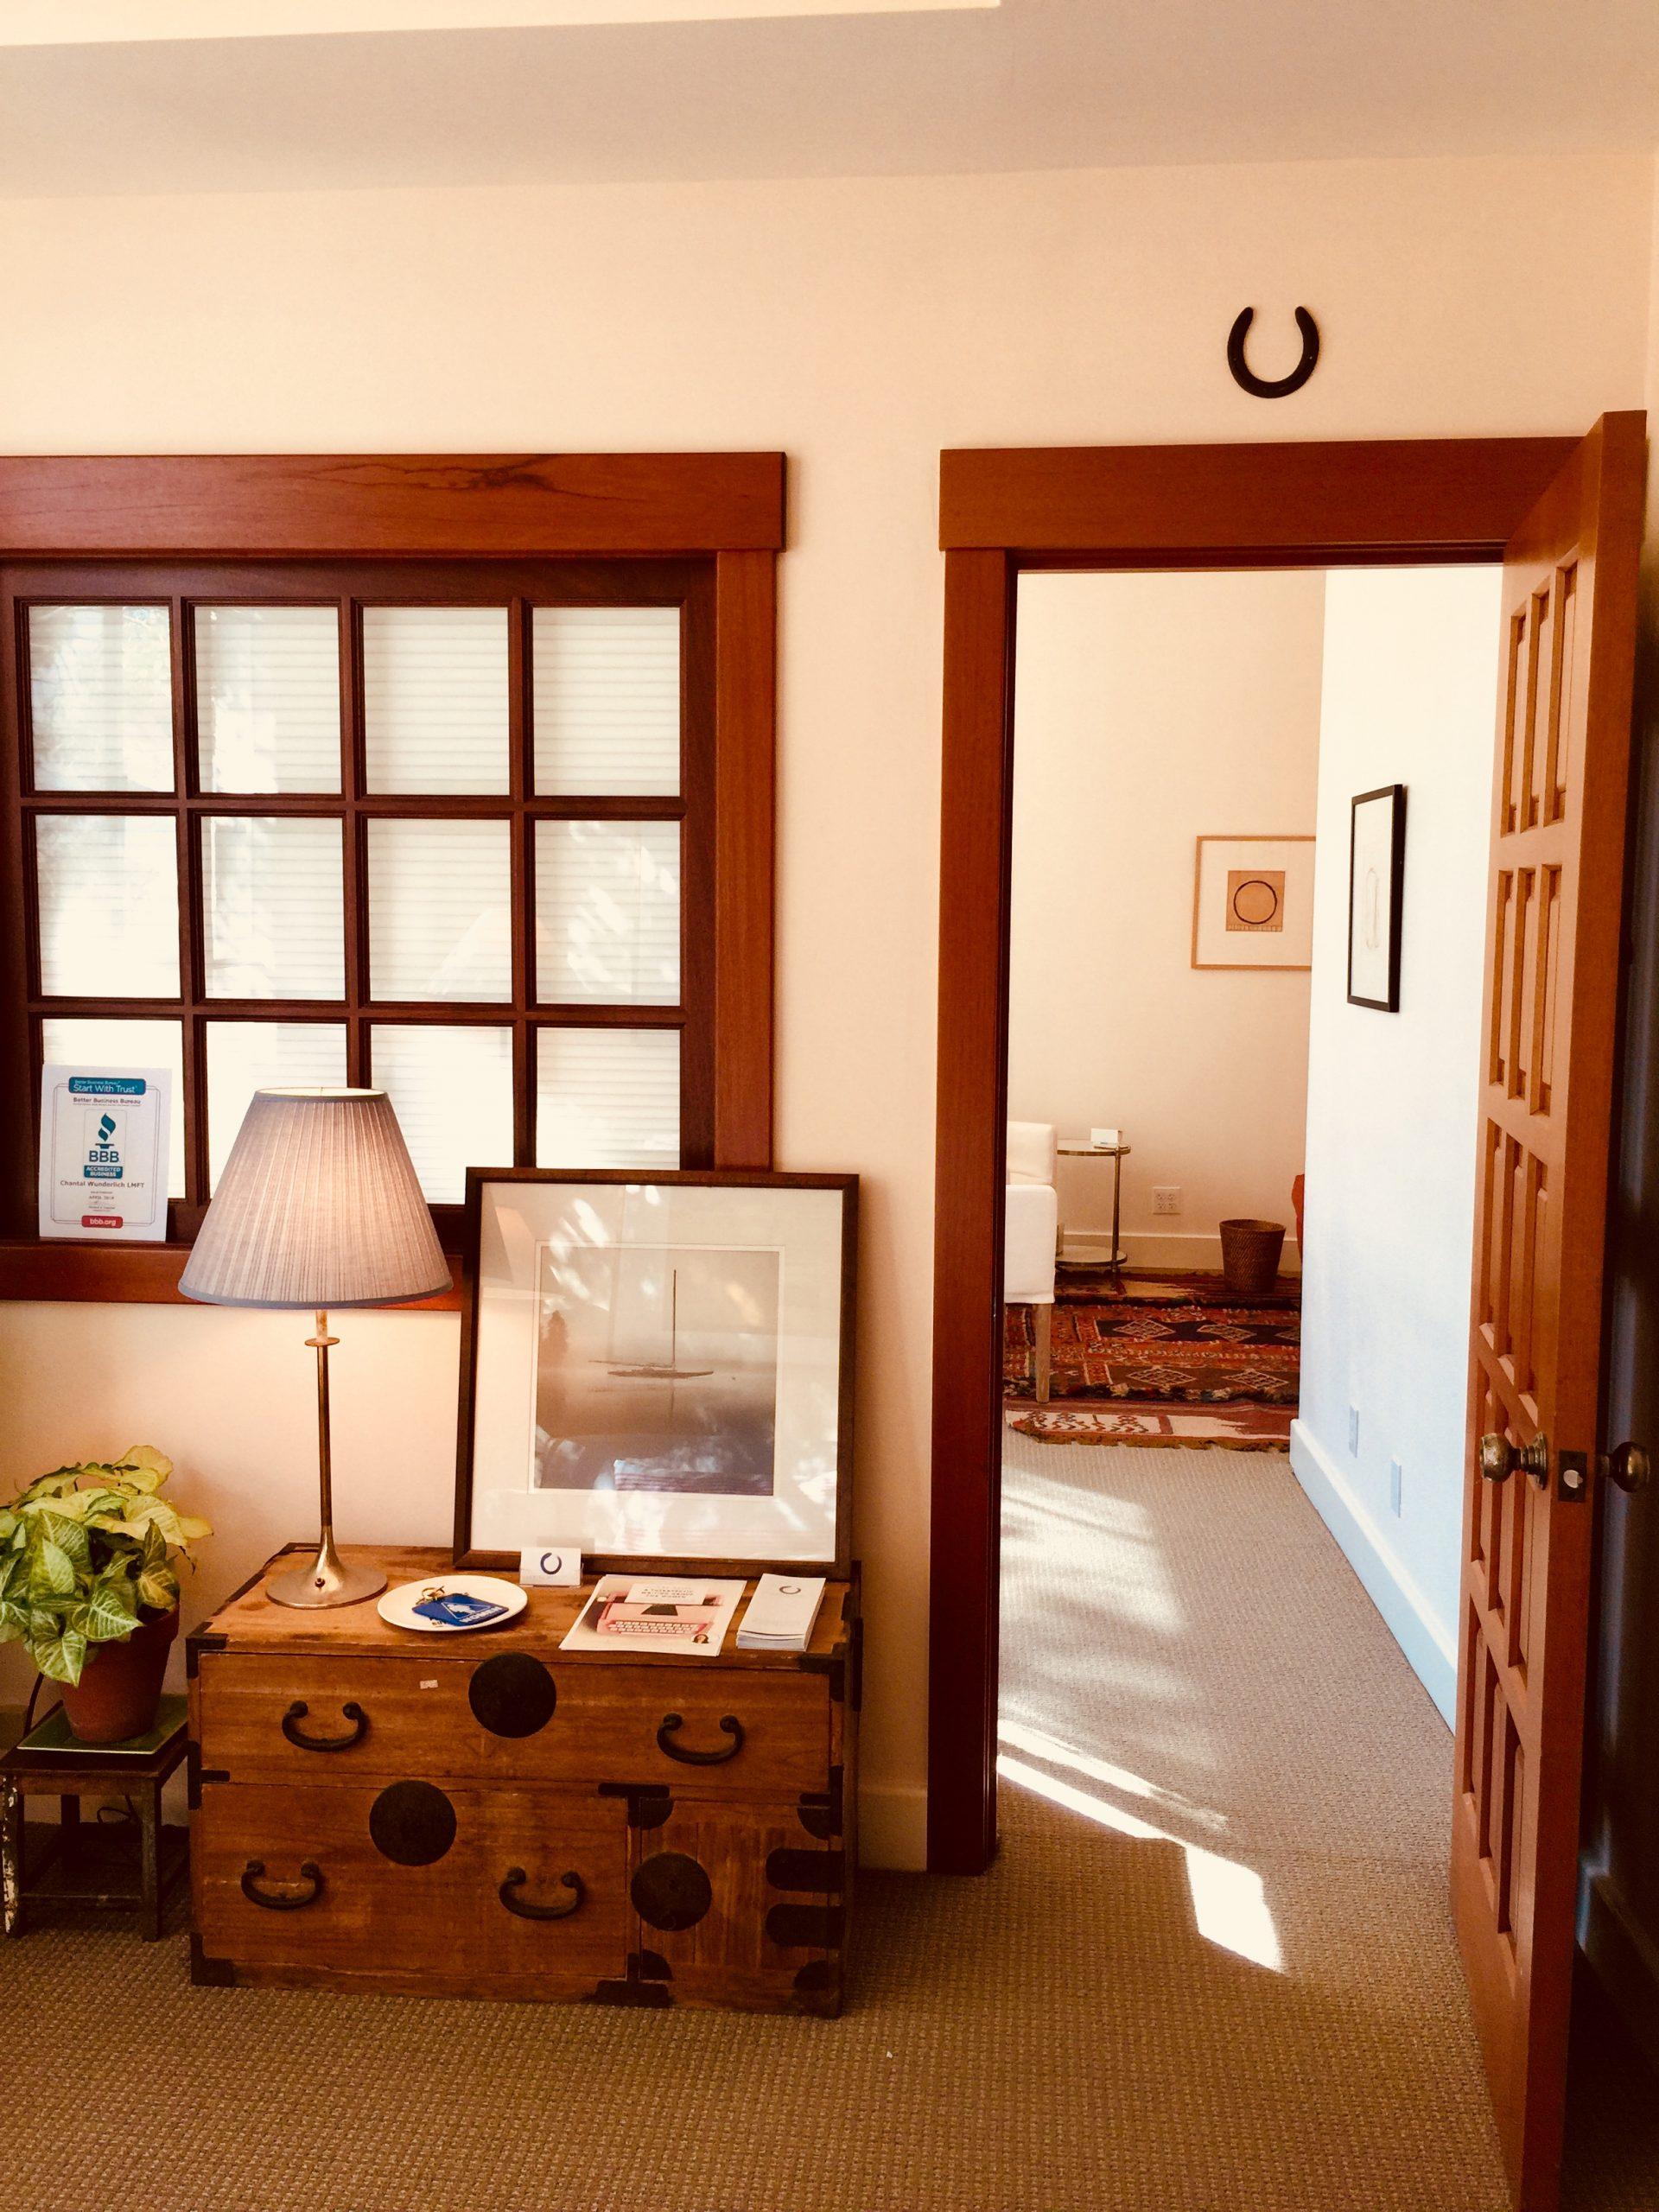 therapy services in santa barbara